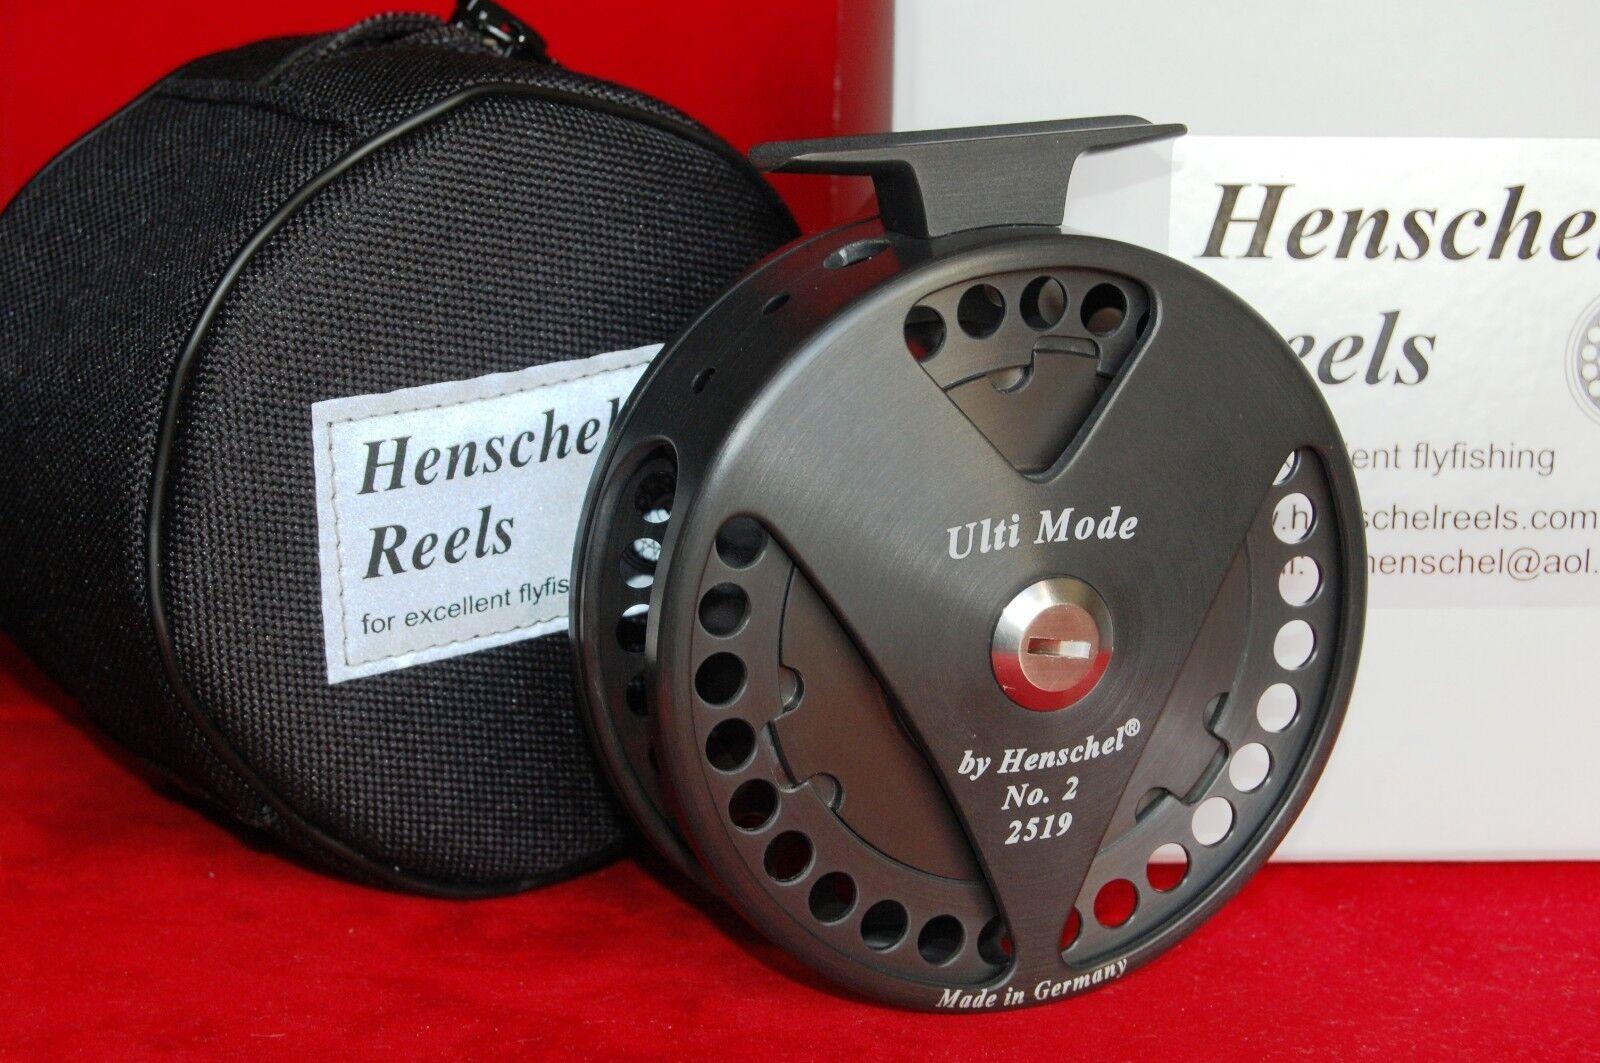 HENSCHEL ULTI MODE saltwater fly reel = Anti Reverse + Direct Drive